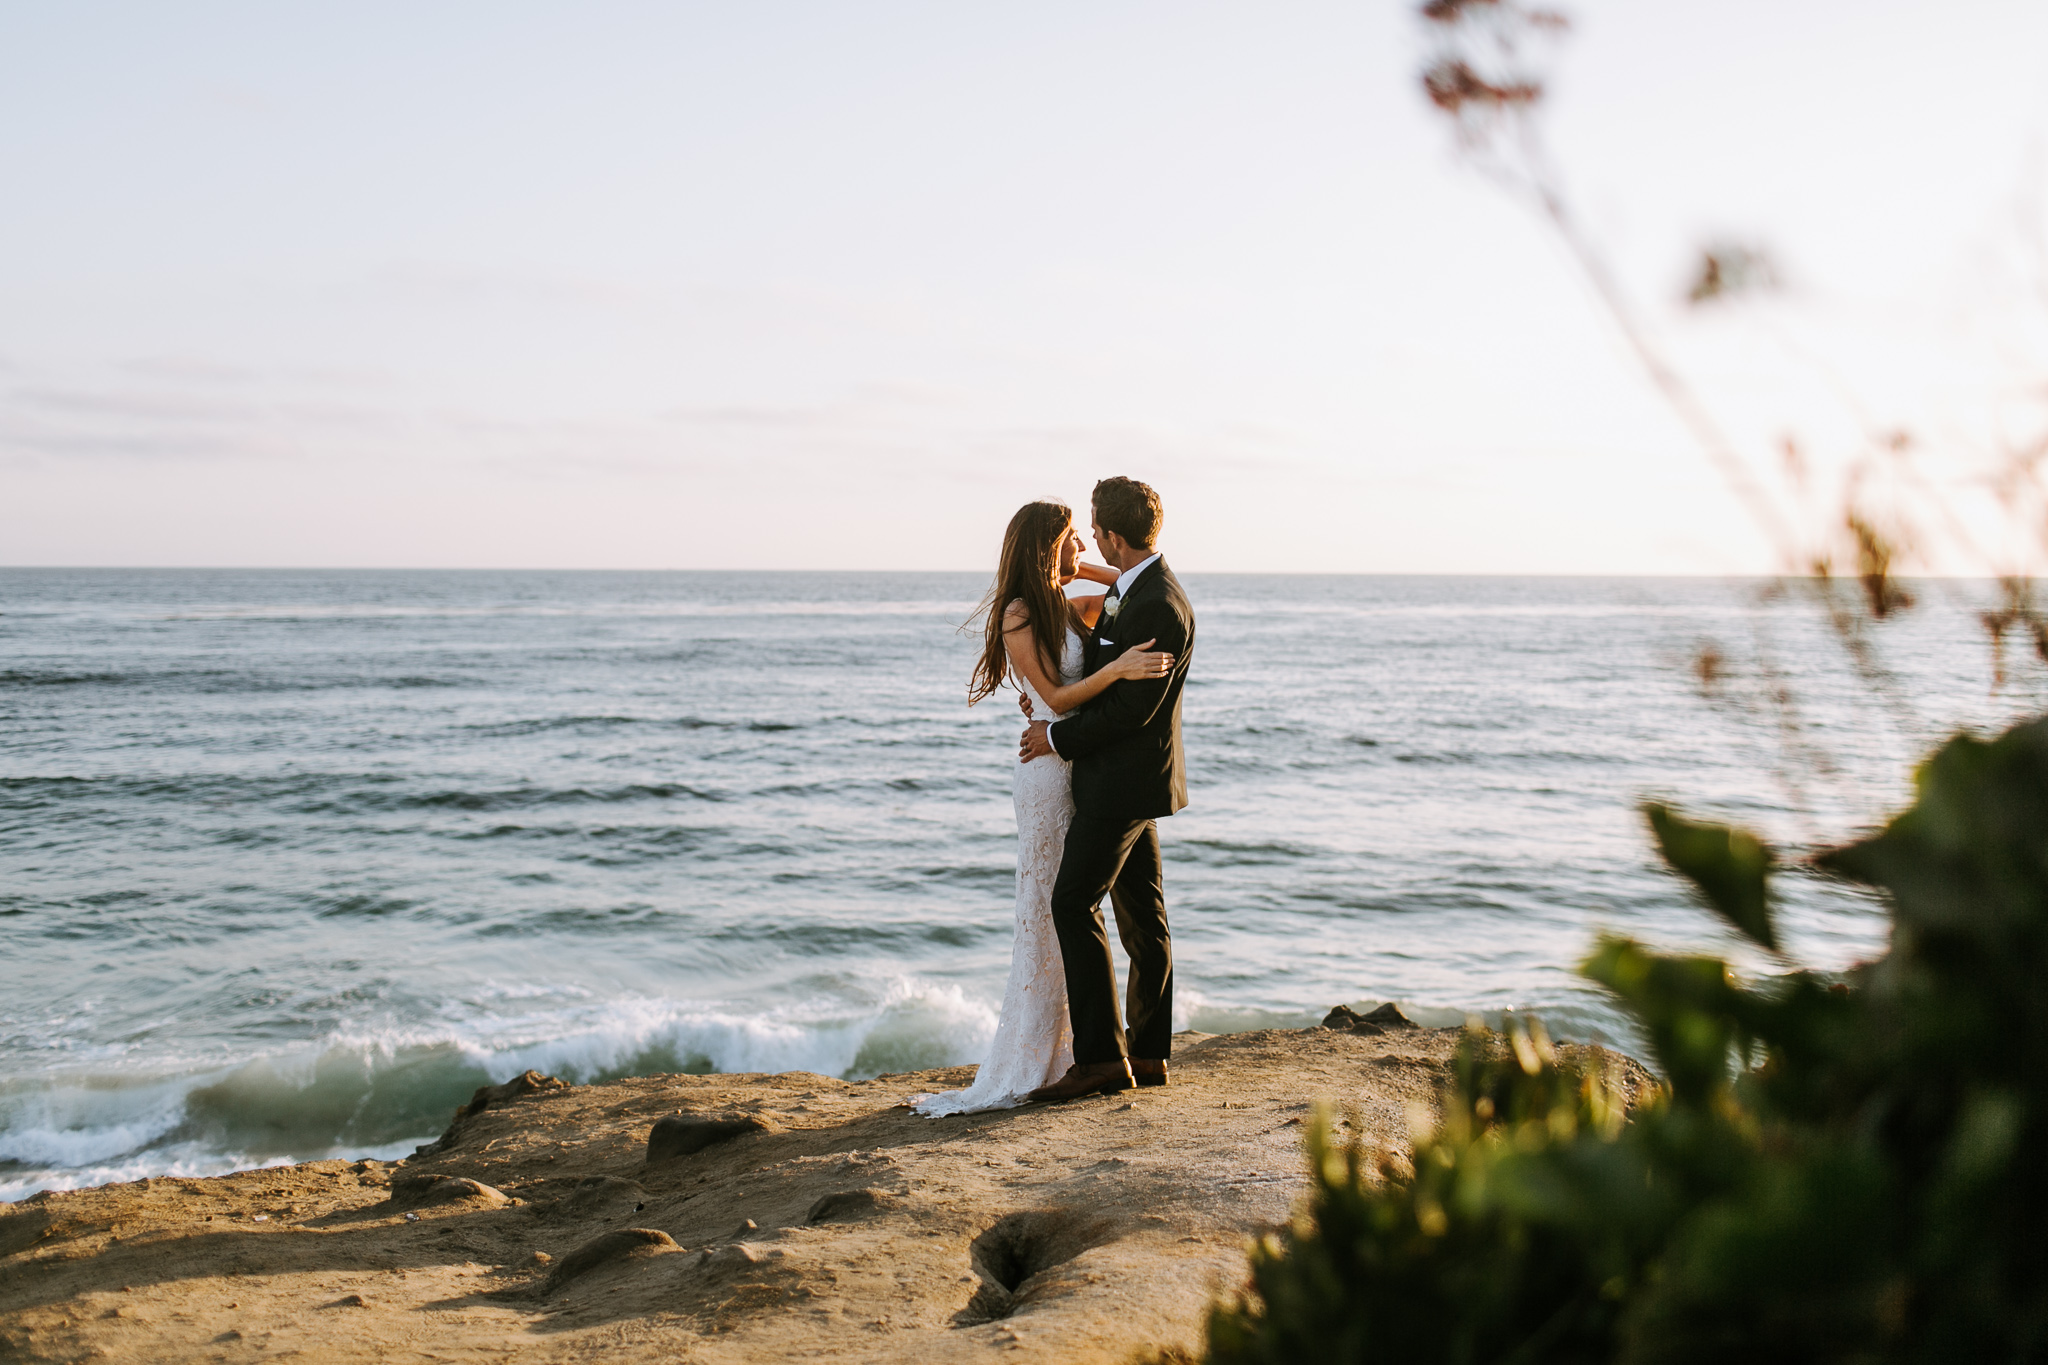 LagunaBeach-WeddingPhotographer-54.jpg